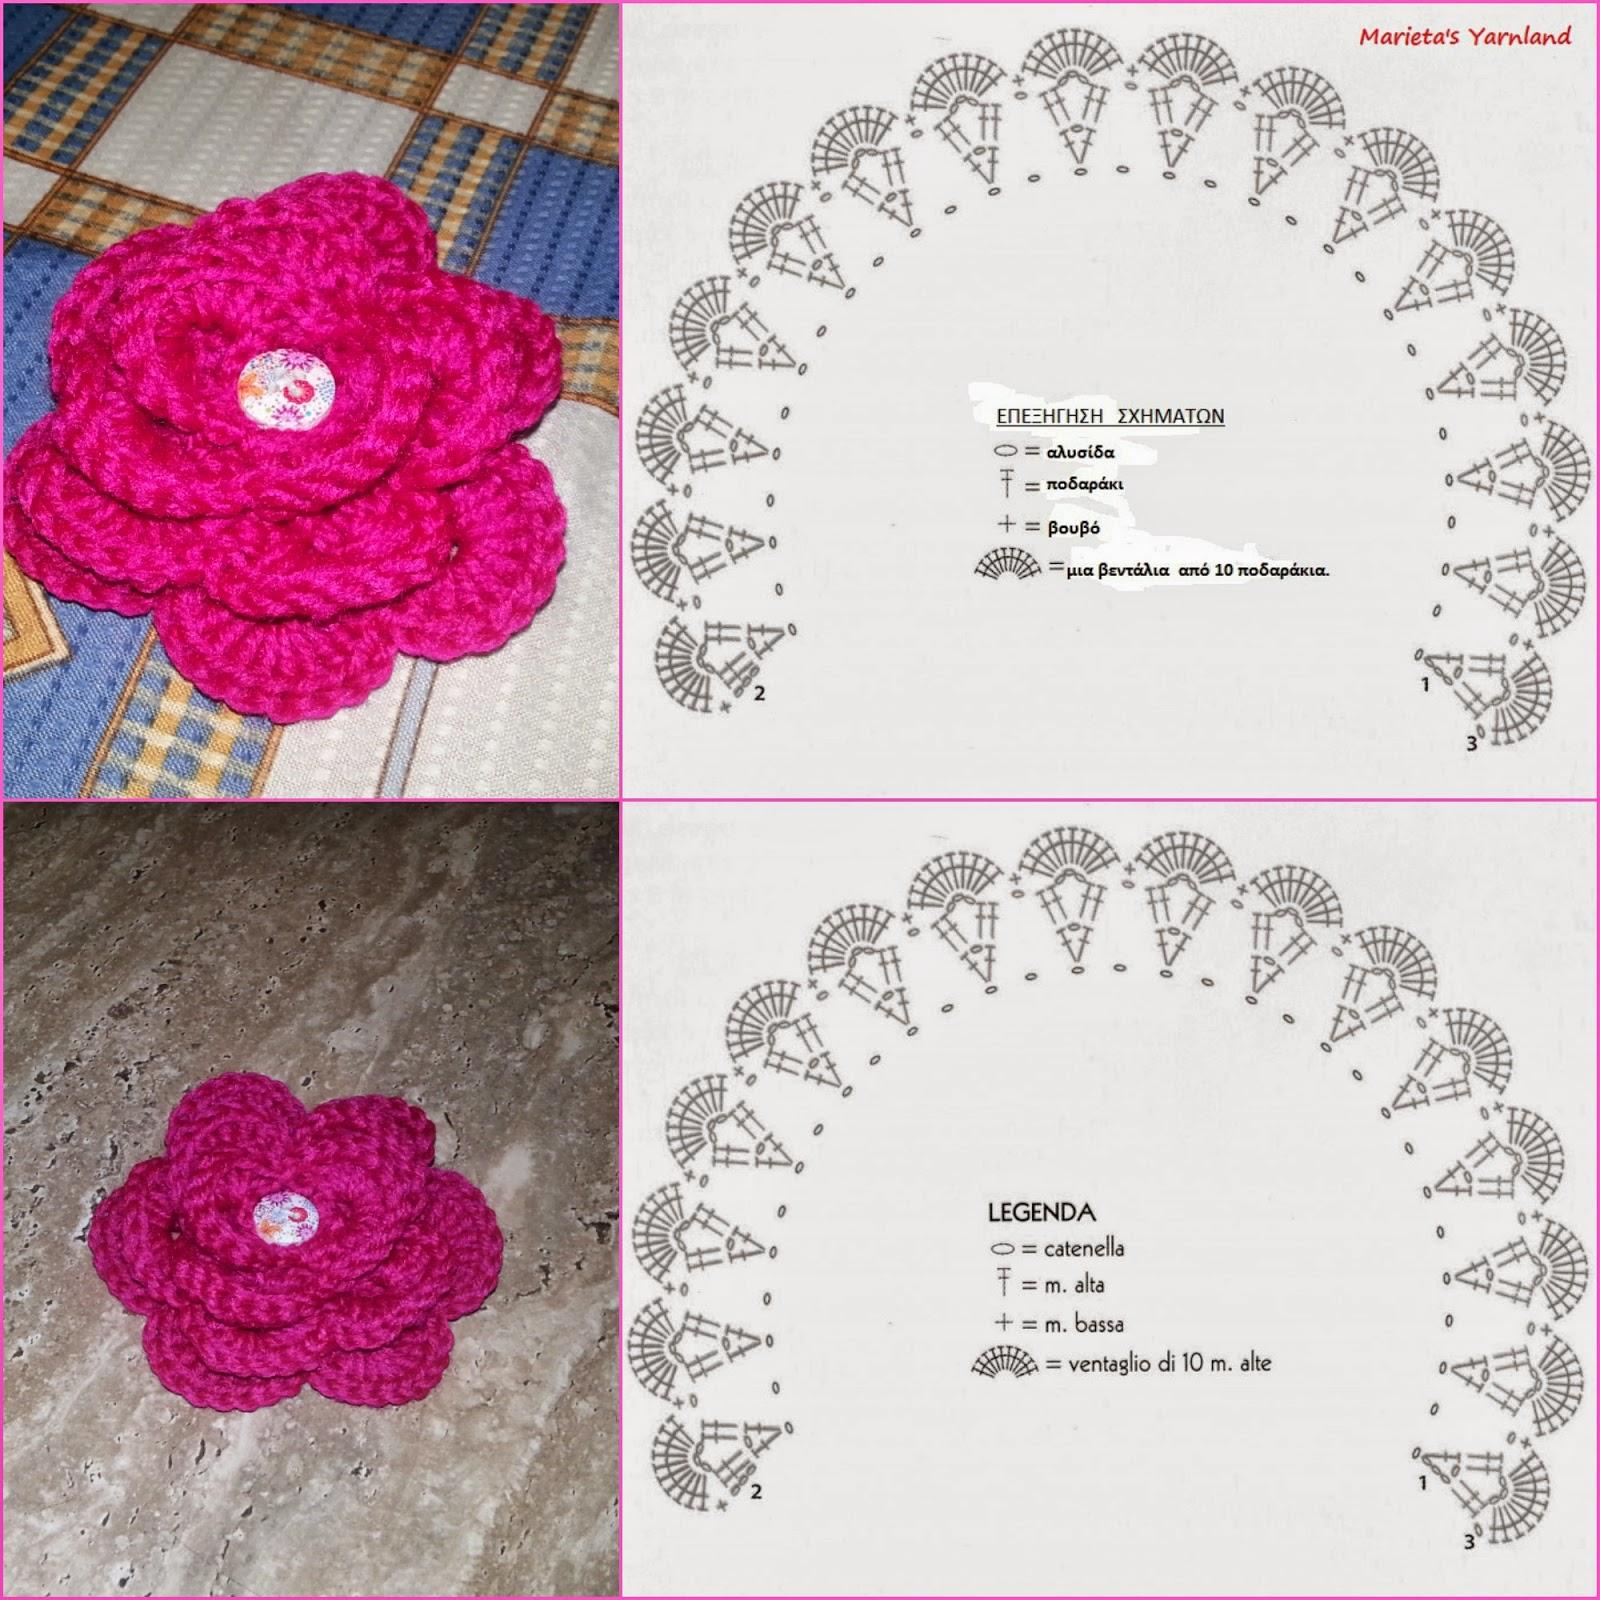 Marietas Yarnland Crochet Flowers Free Patterns Diagrams Video Pattern Diagram